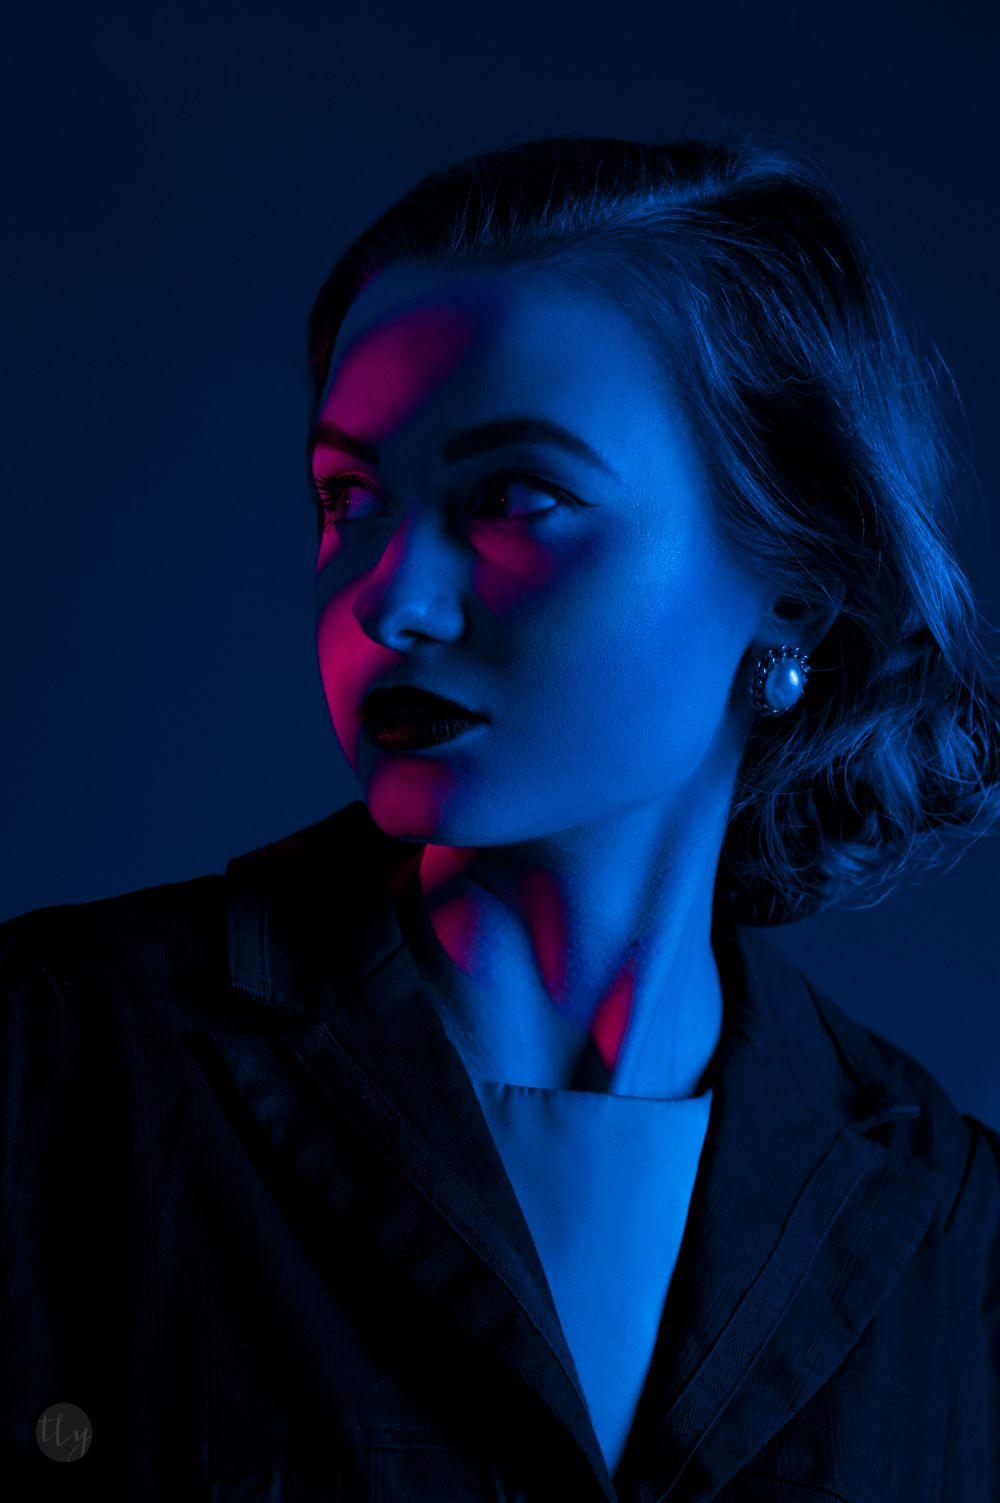 Neon Light Portrait On Behance: Portrait Photography Editing